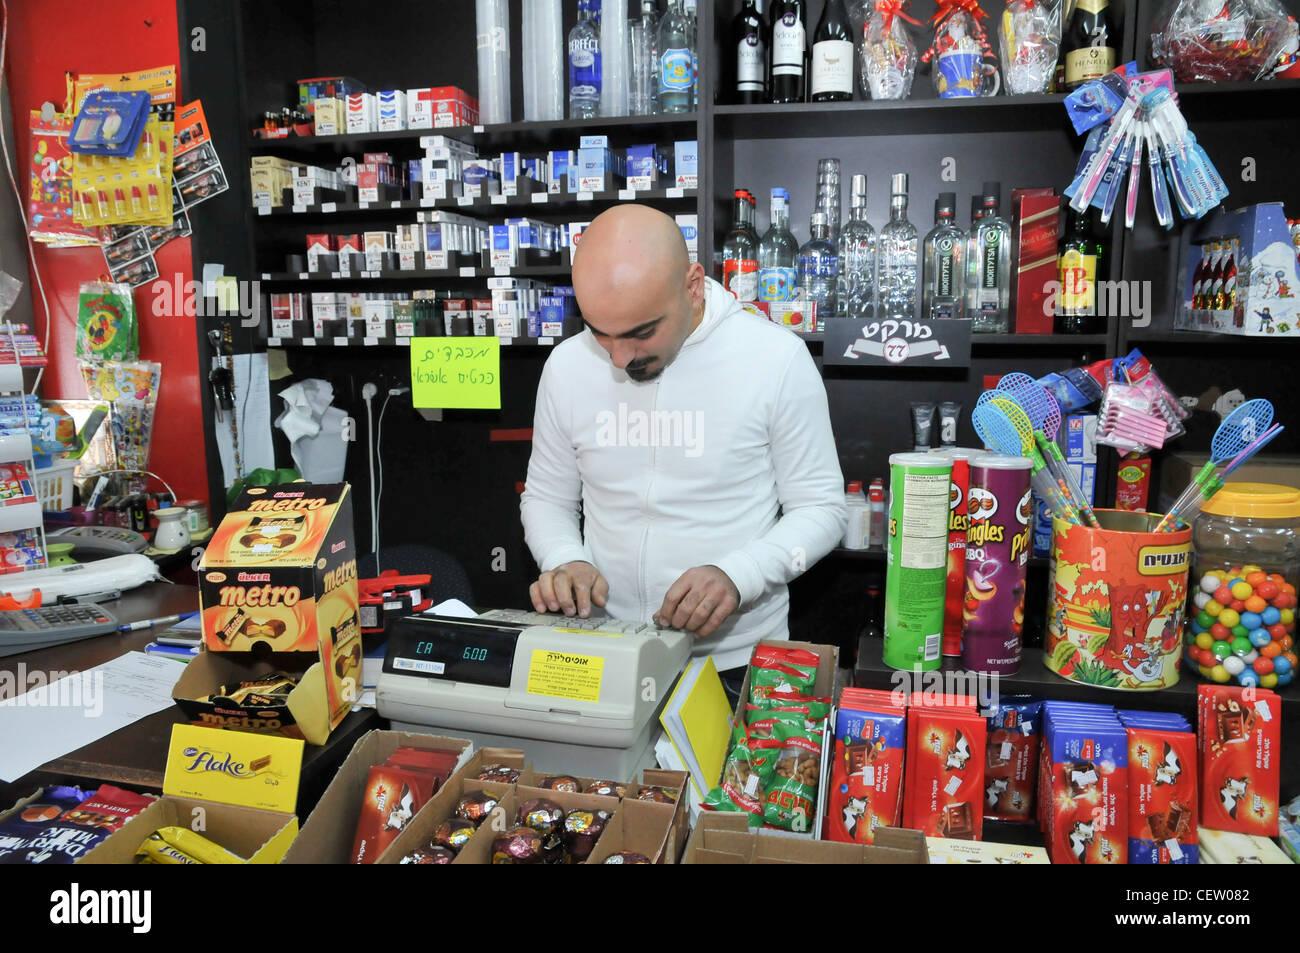 Israel, Haifa, Grocery Shop - Stock Image